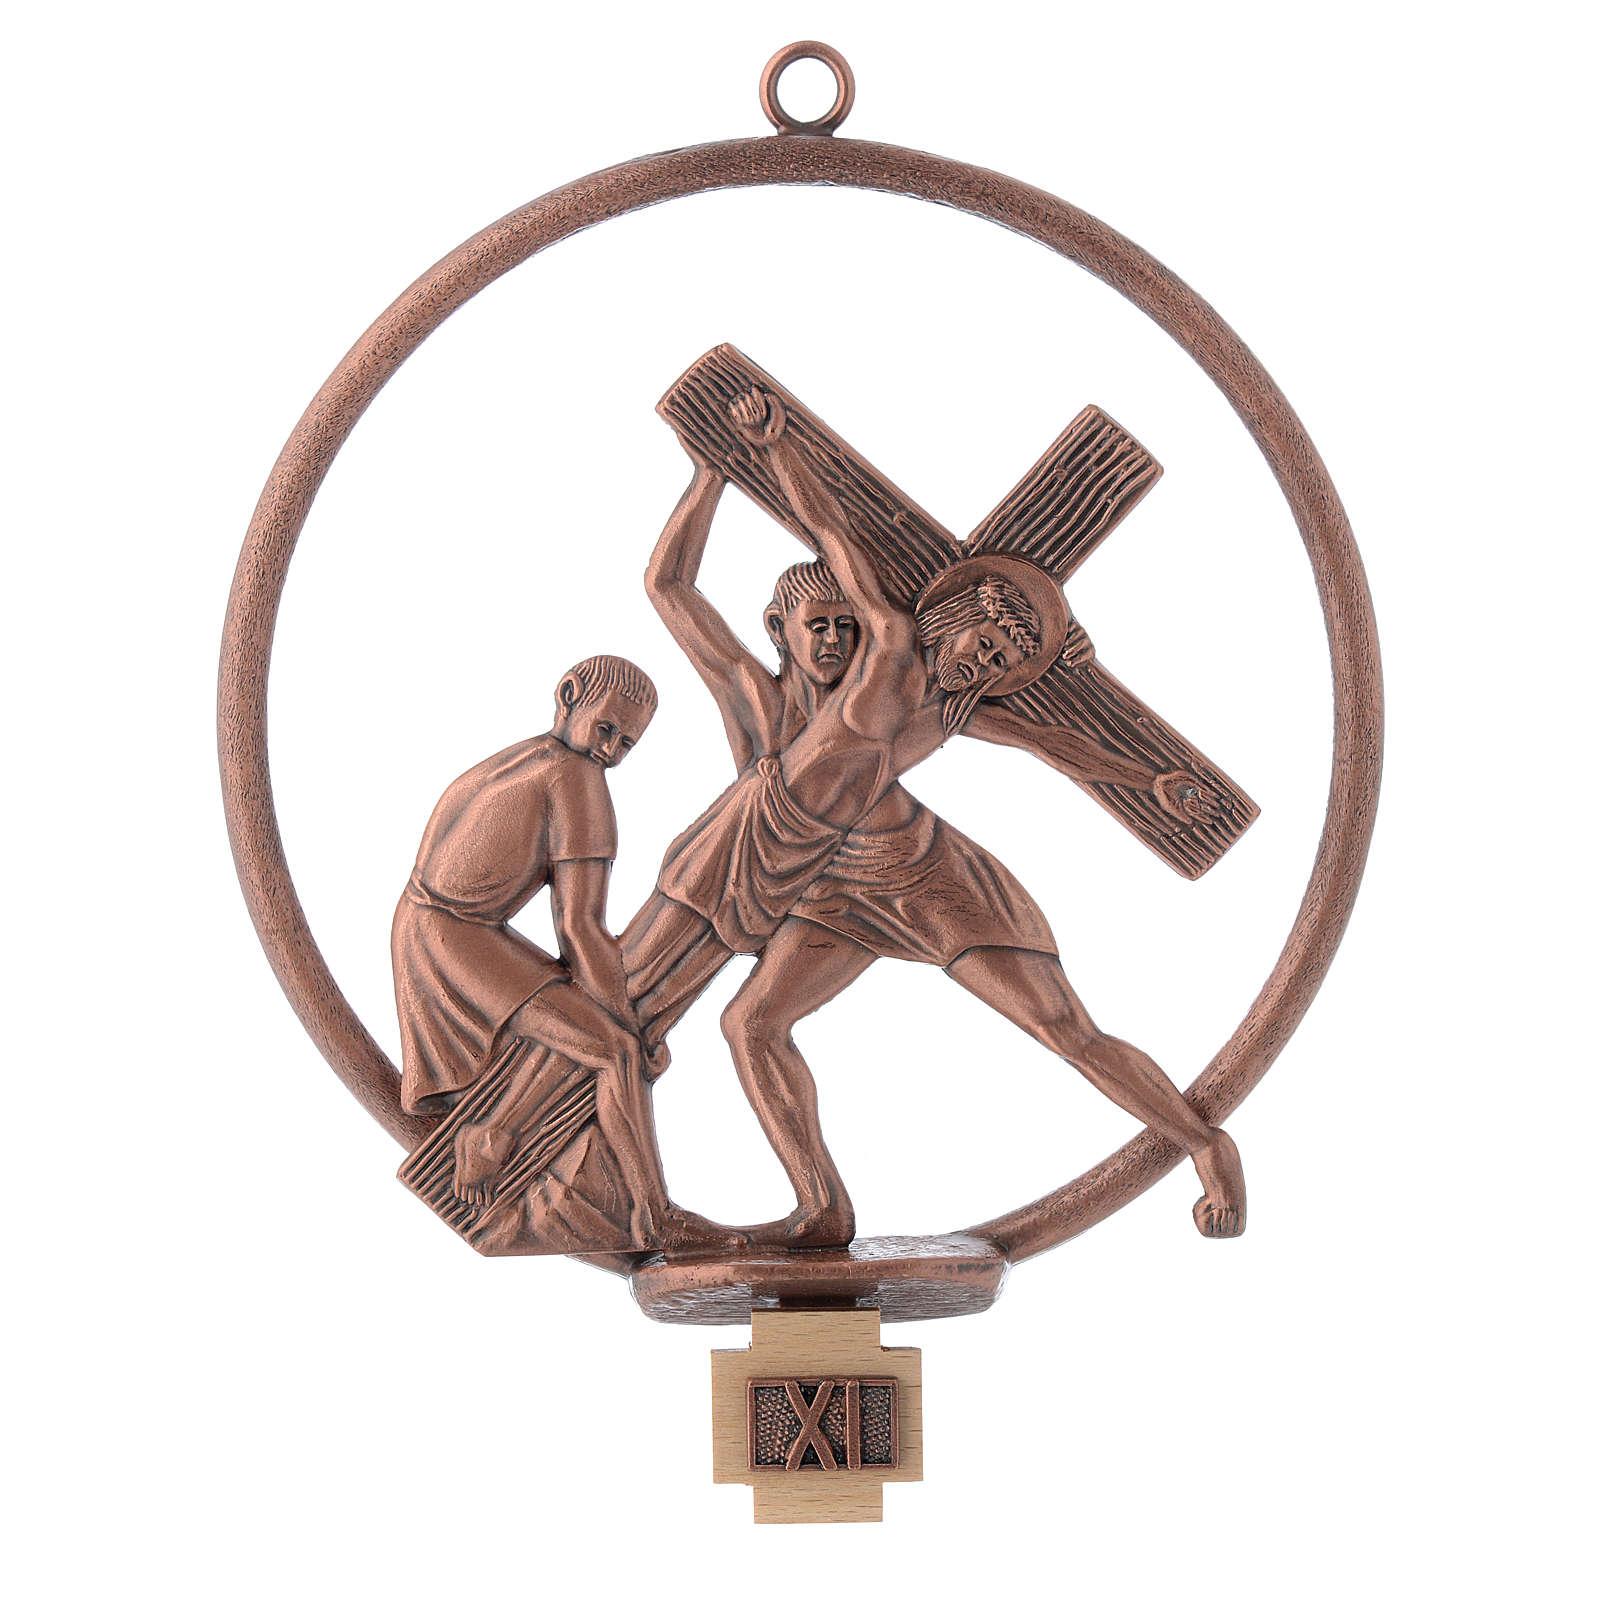 Via Crucis 15 stazioni tonda bronzo ramato 4